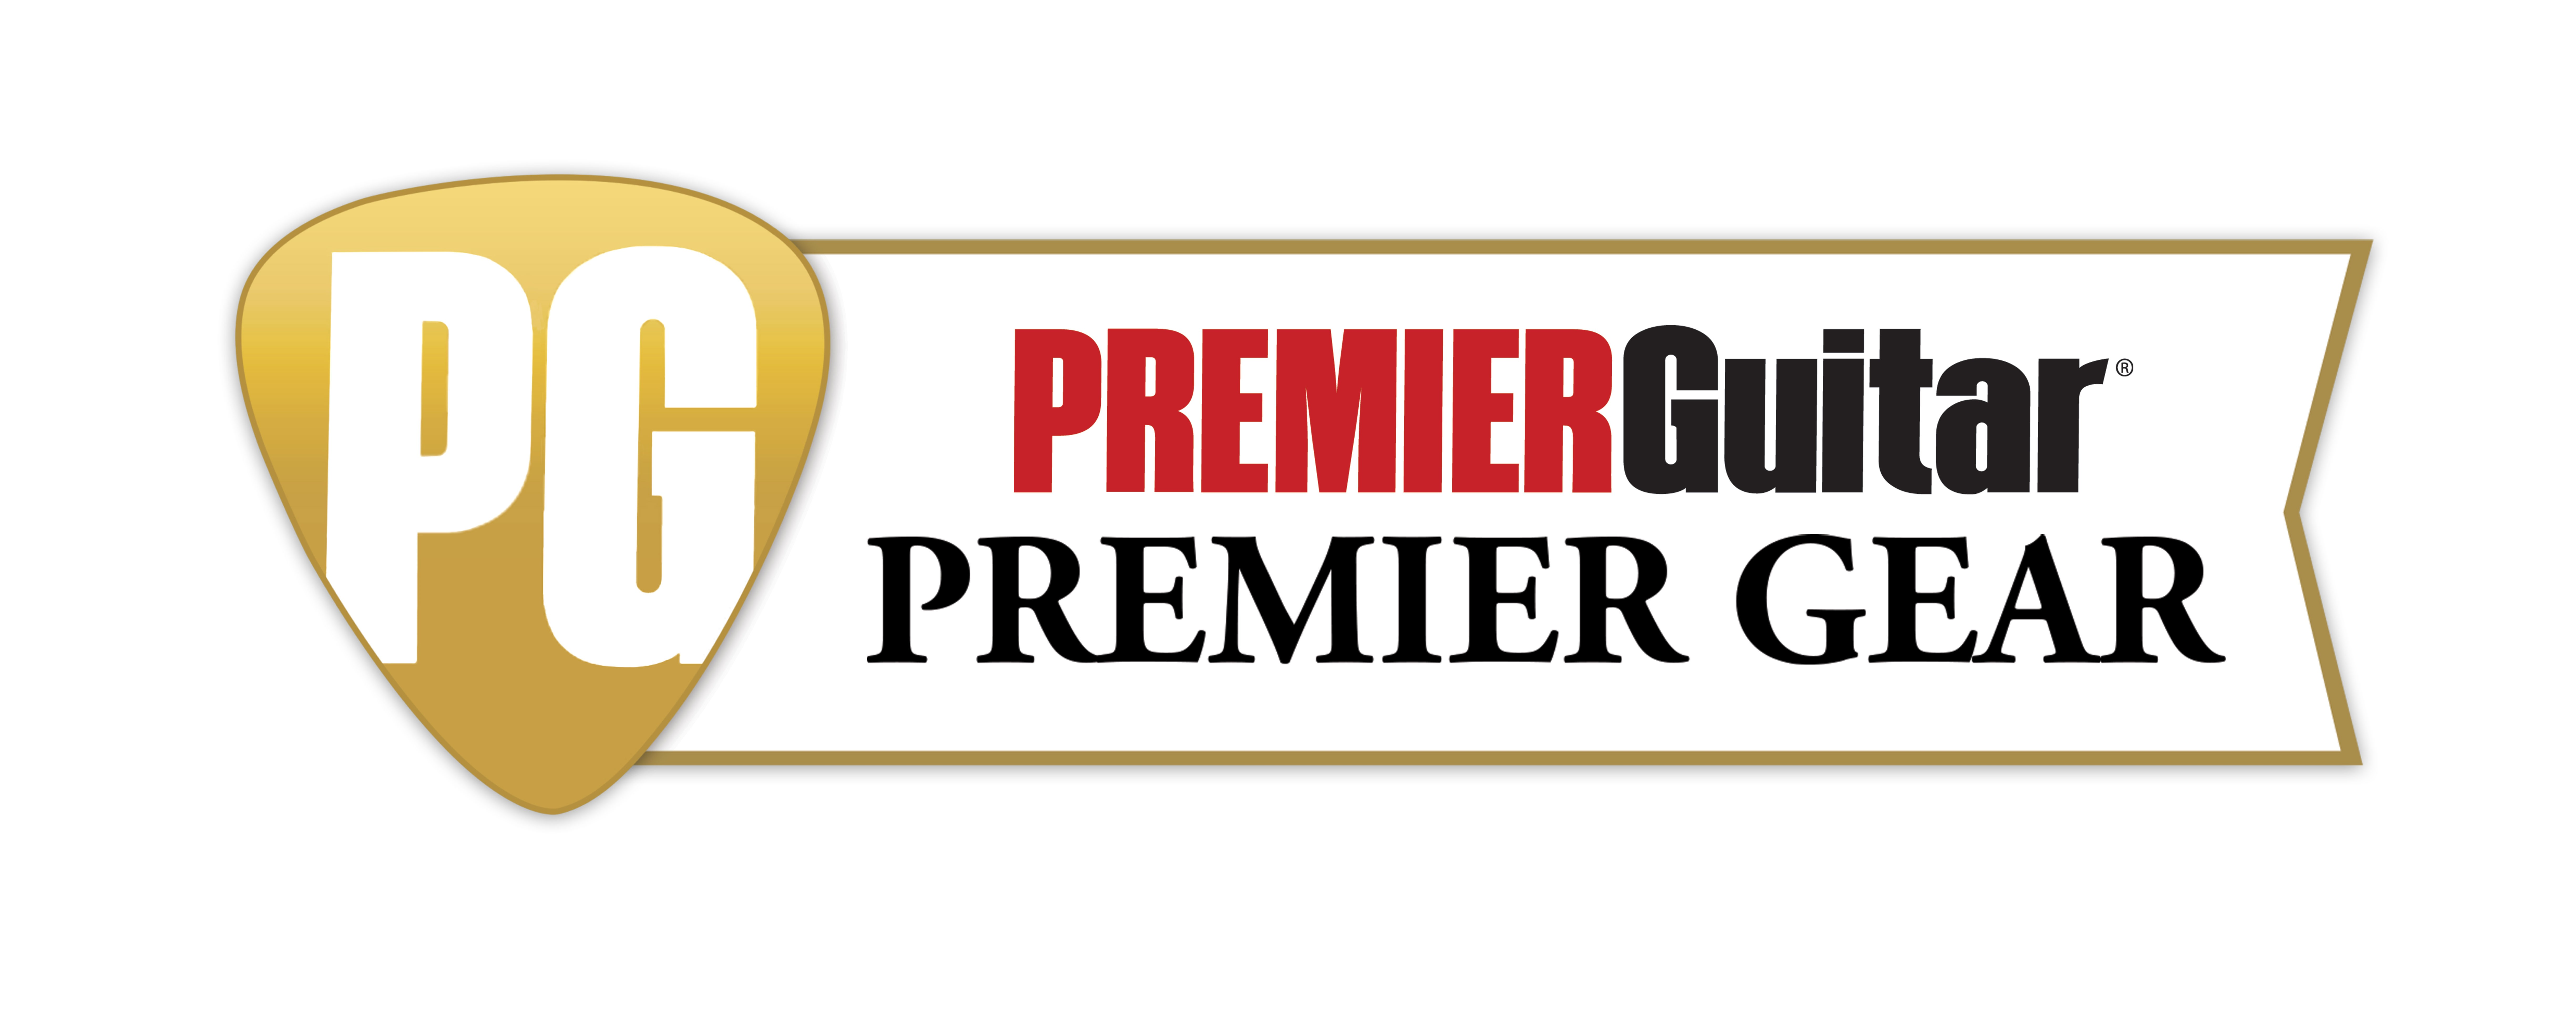 PG_PremierGearAward_Gold